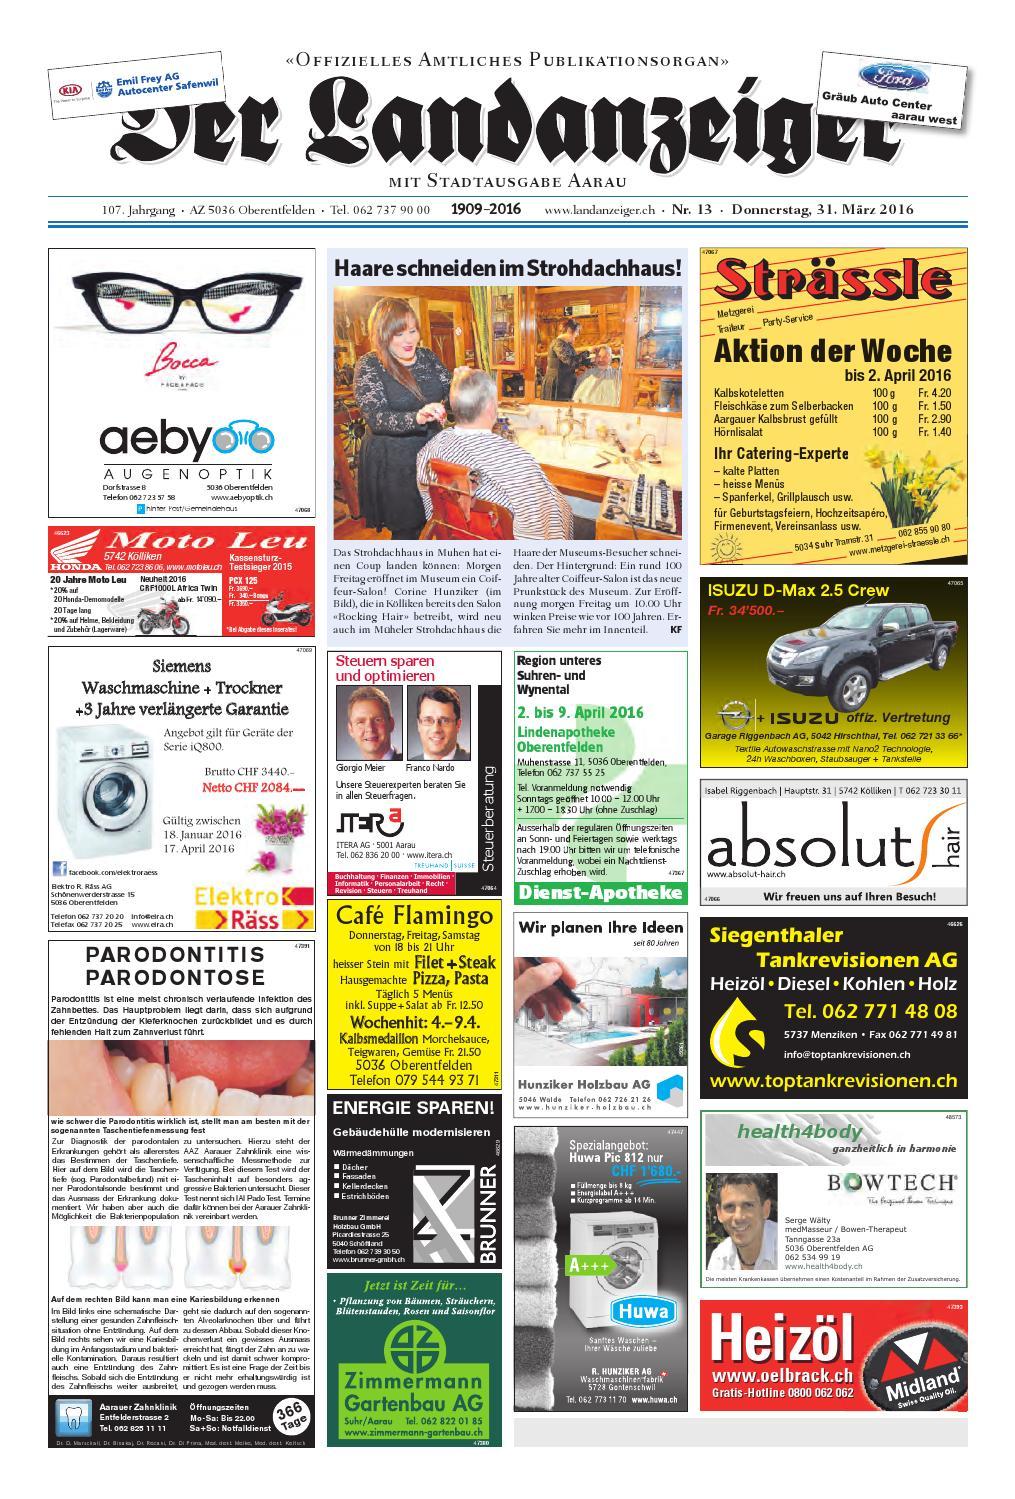 Der Landanzeiger 13 16 by ZT Medien AG - issuu 68a5e7fbe2